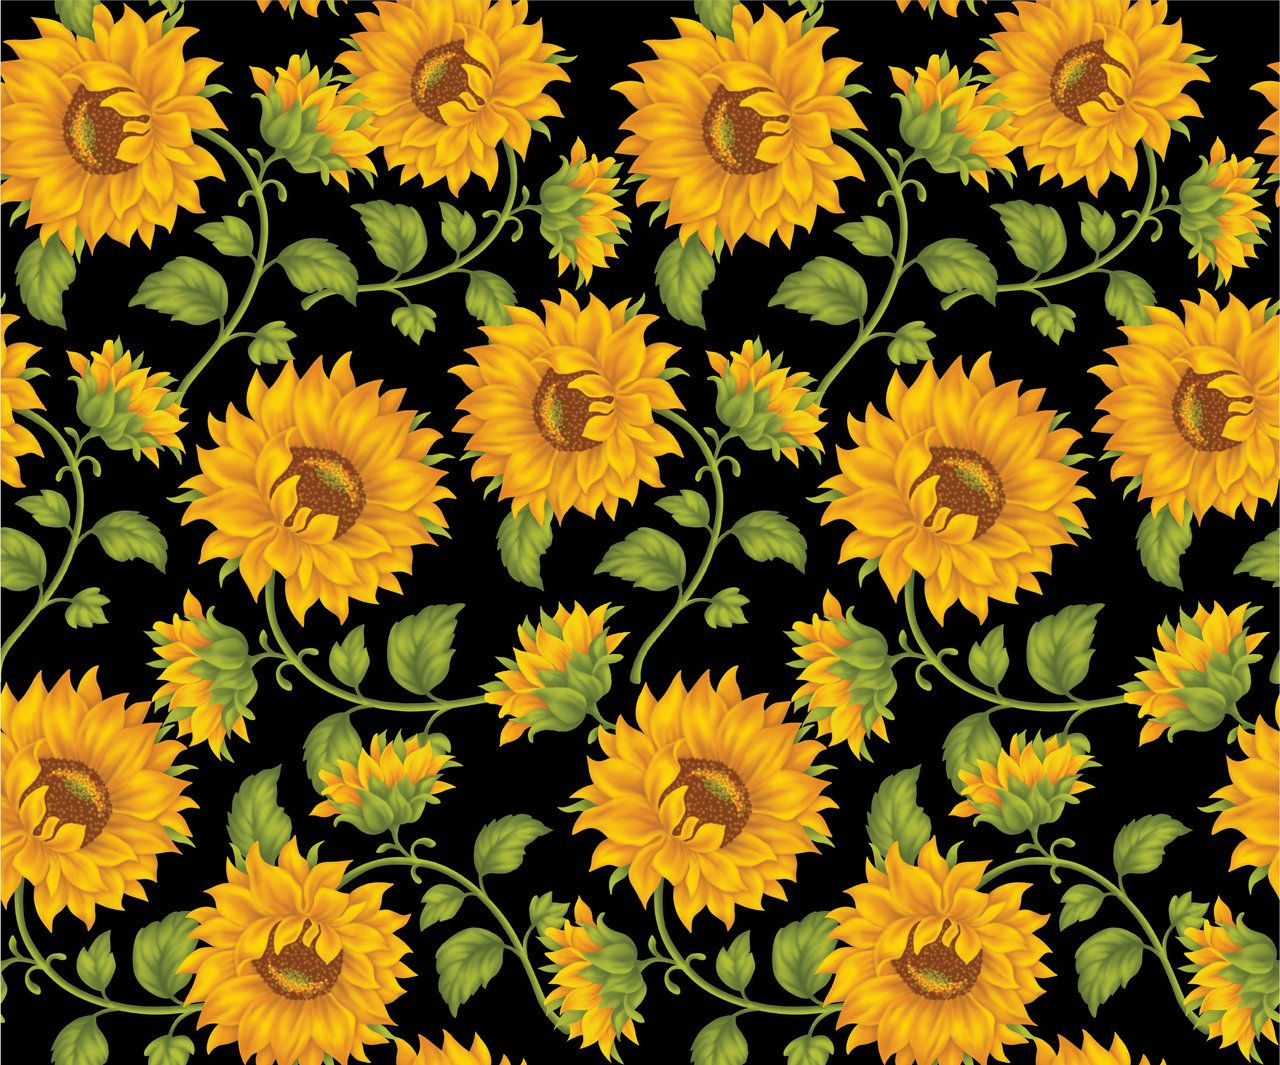 Desktop Wallpaper 4u2 Sunflower Tumblr Hd Desktop Wallpaper Sunflower Wallpaper Black Background Wallpaper Sunflowers Background